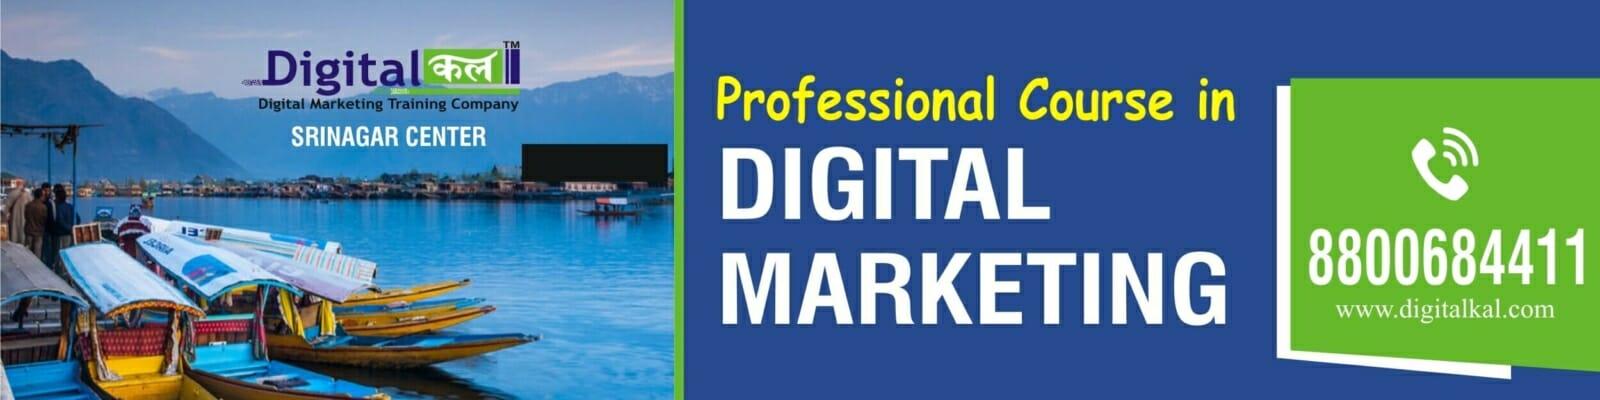 Digital Marketing Course Srinagar